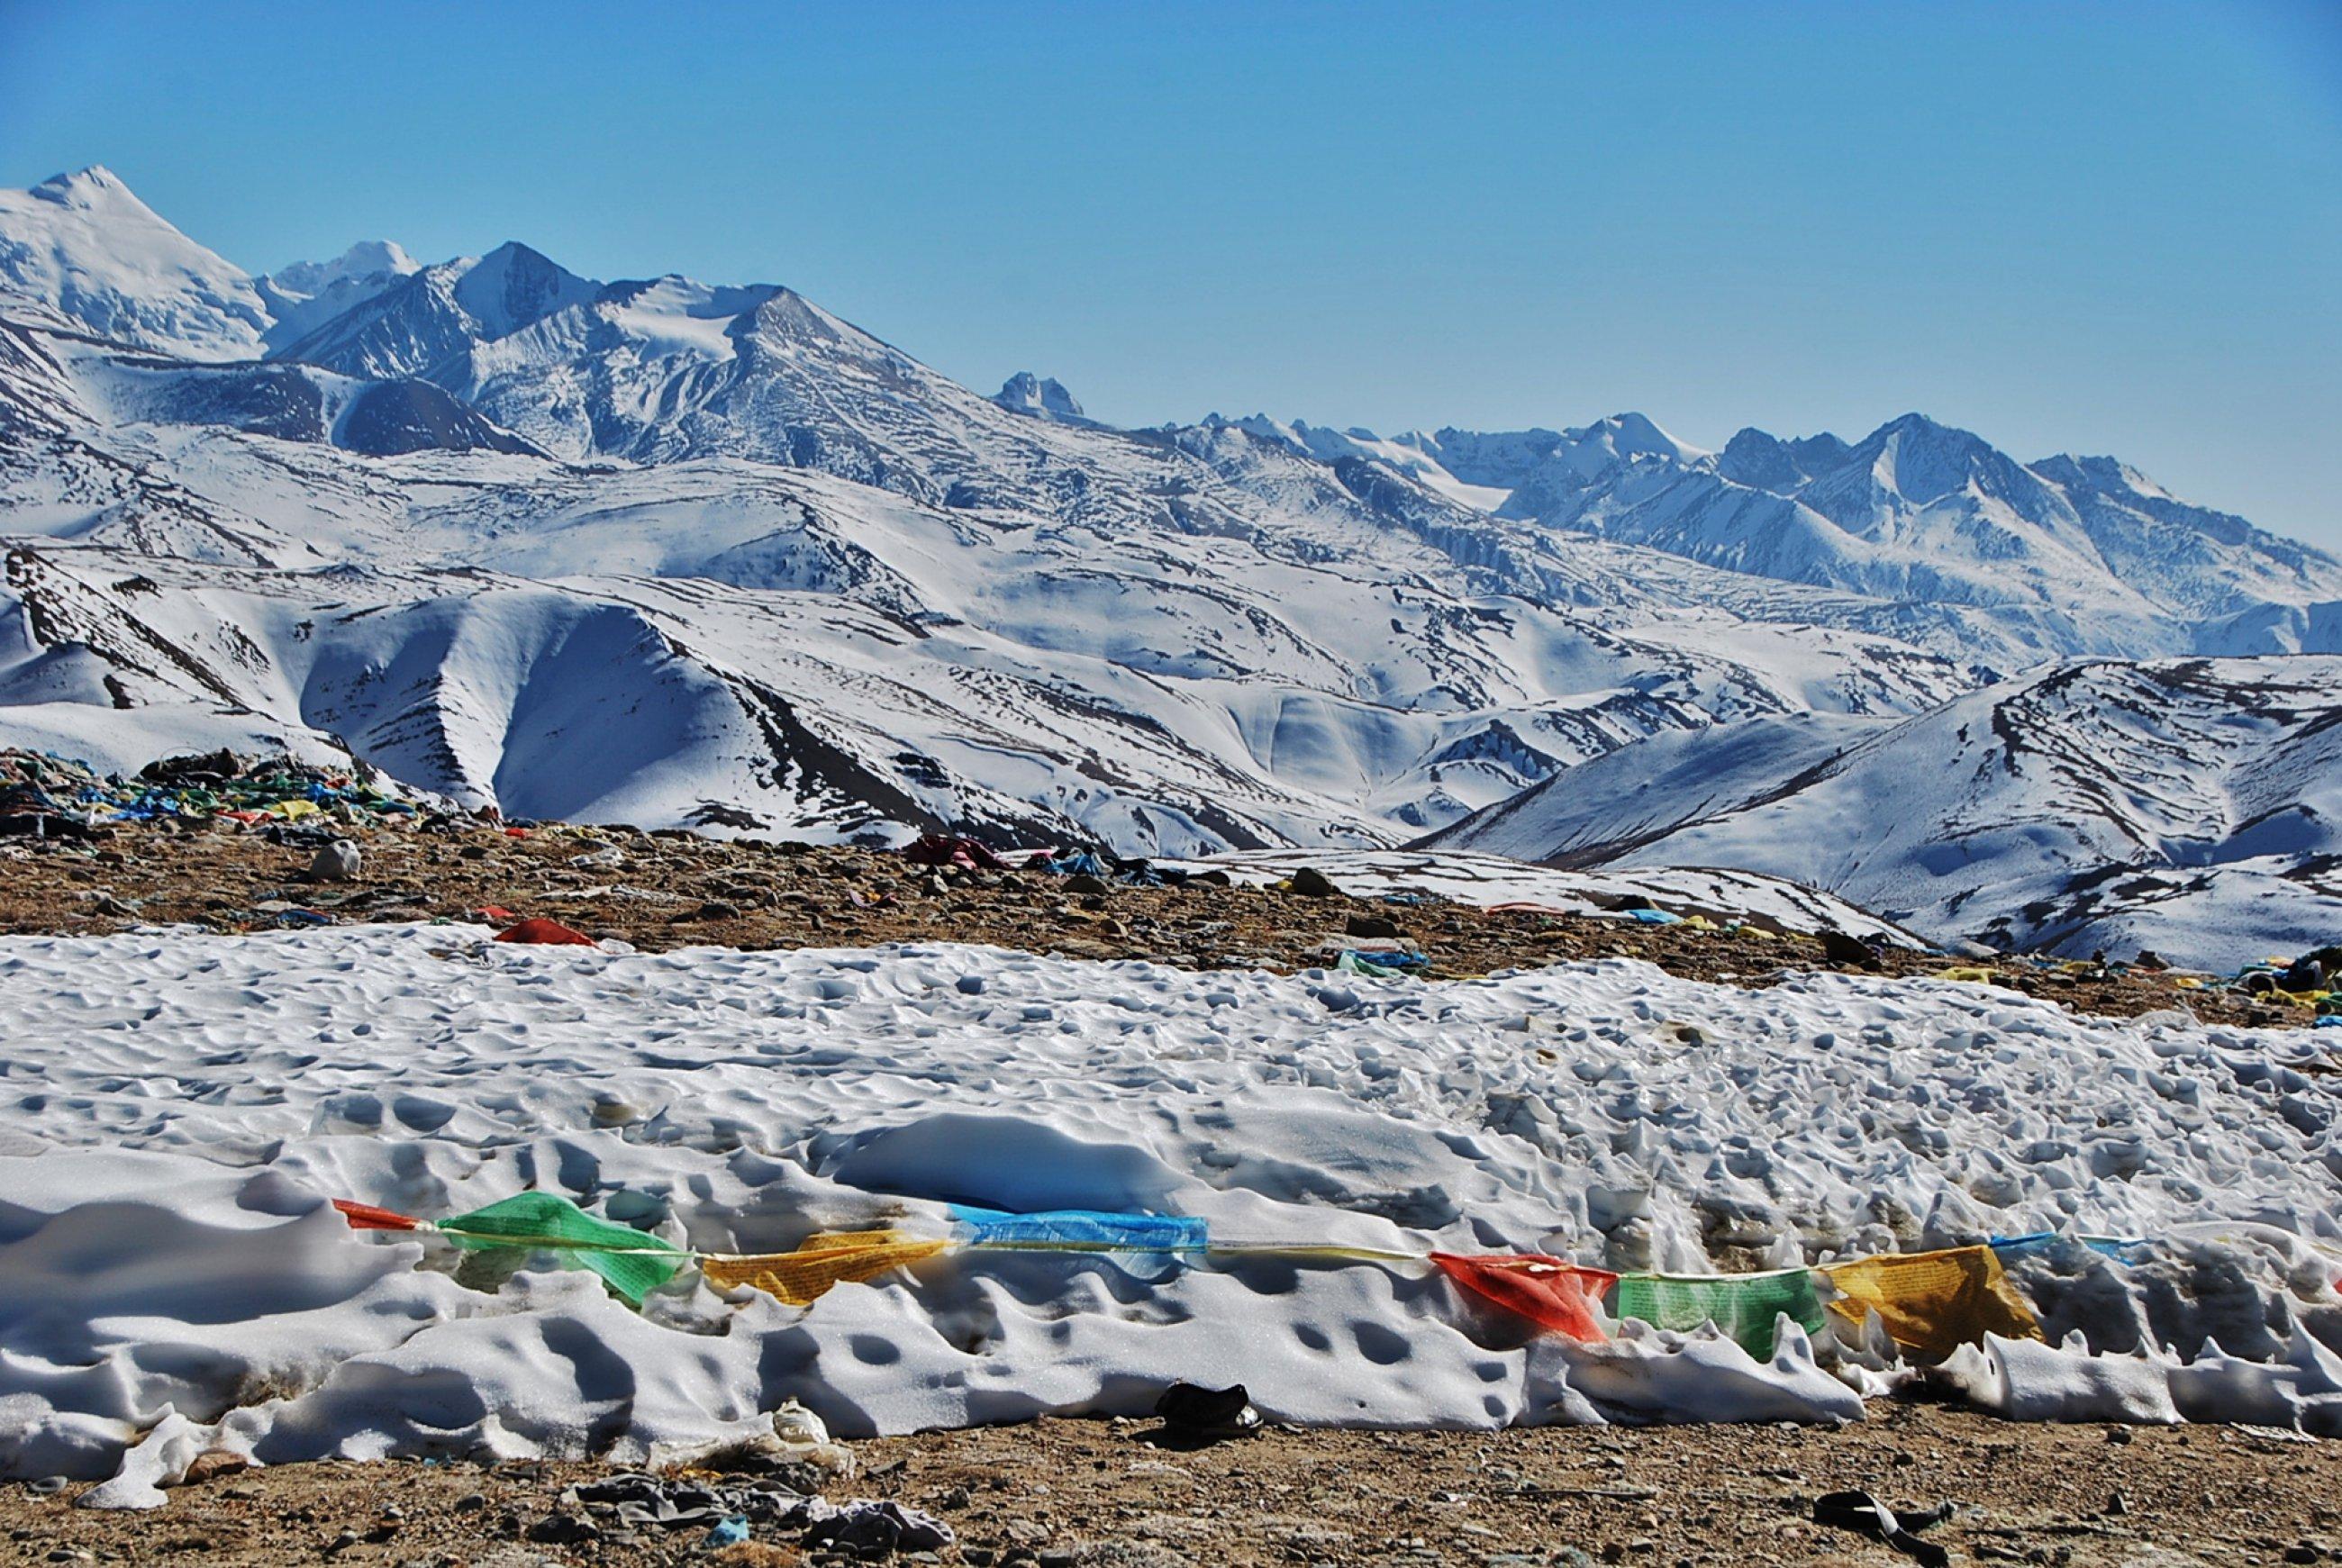 https://bubo.sk/uploads/galleries/16317/tibet-himalaje-11-2014-mirka-sulka-315-.jpg